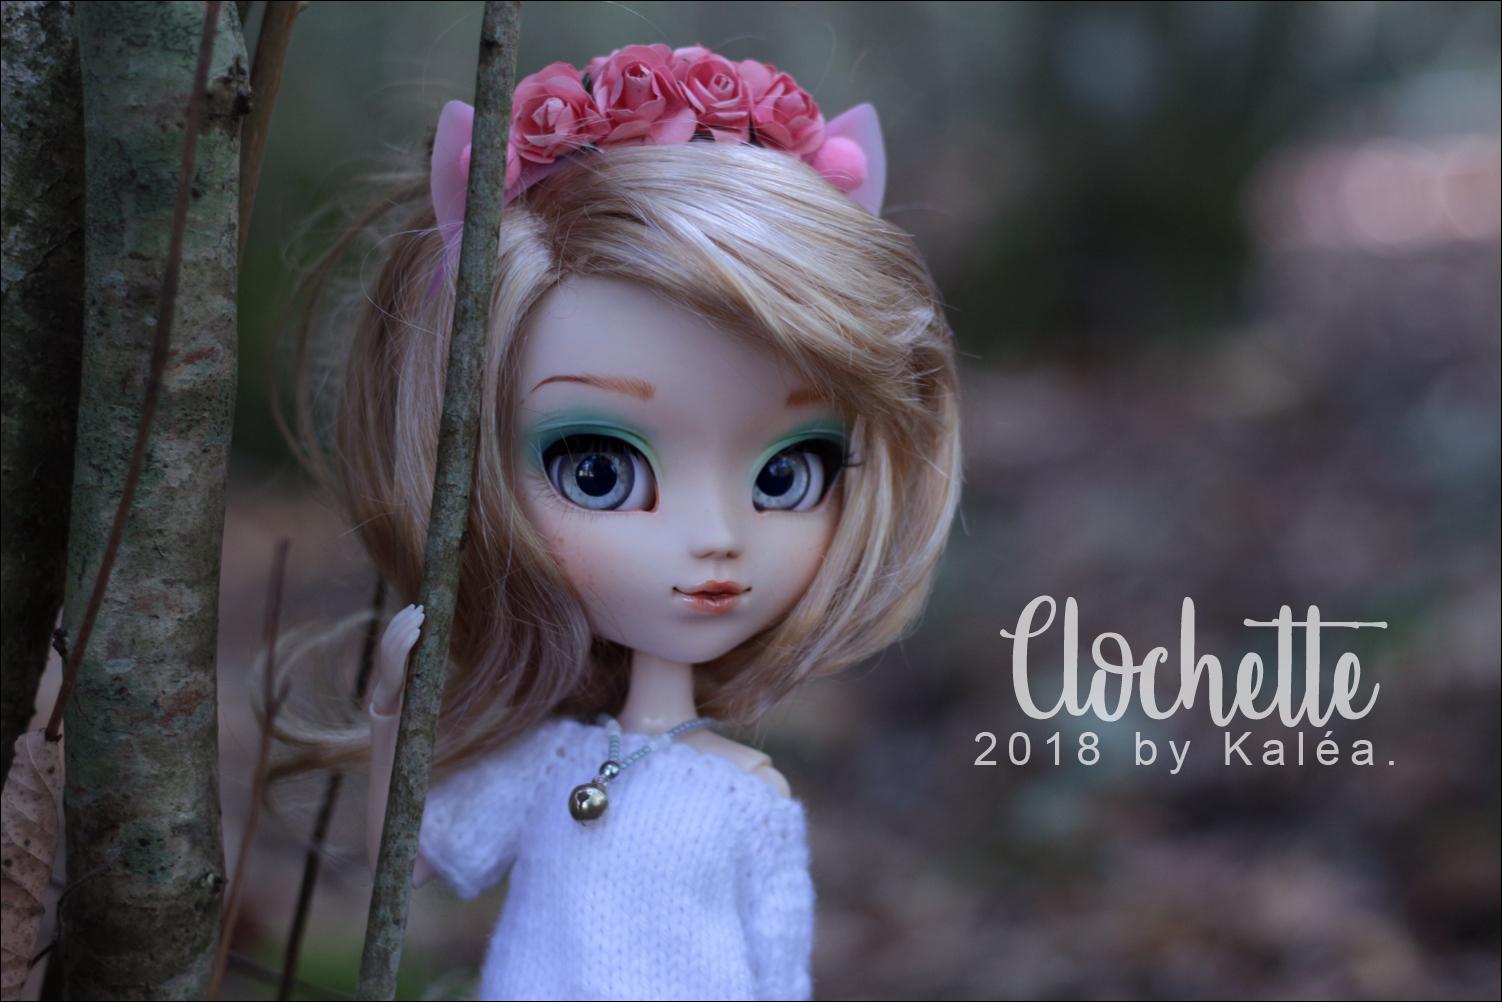 [Blog/Youtube] Kaléa's 18091205283888070